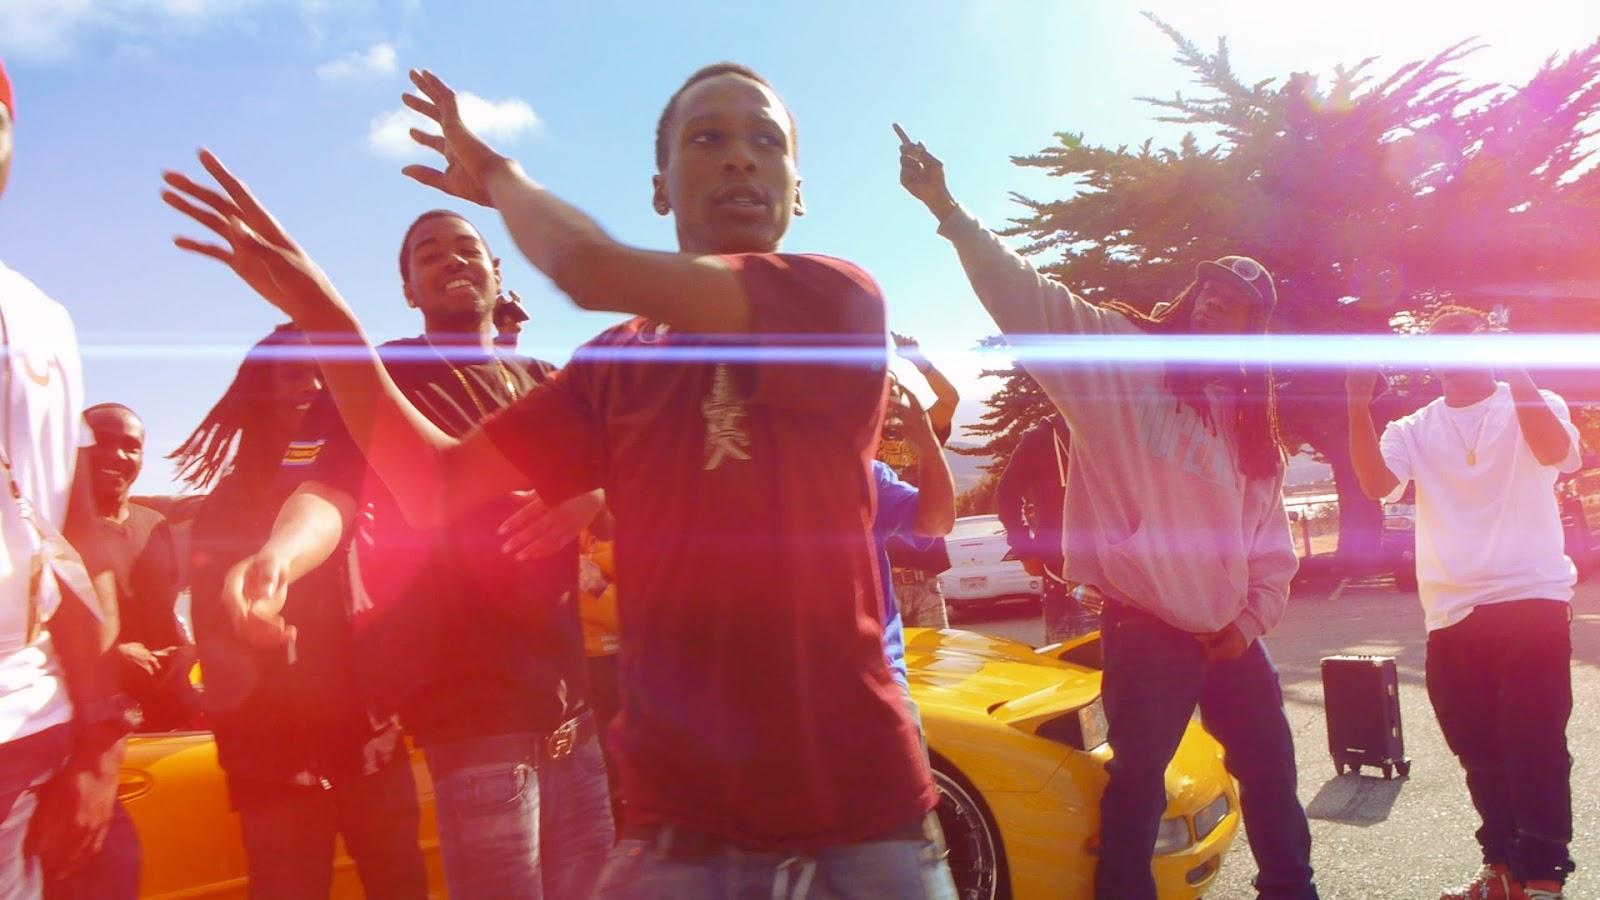 Philly B - Aye Thot (Feat. LB & Professor N.A.N) [Vídeo]